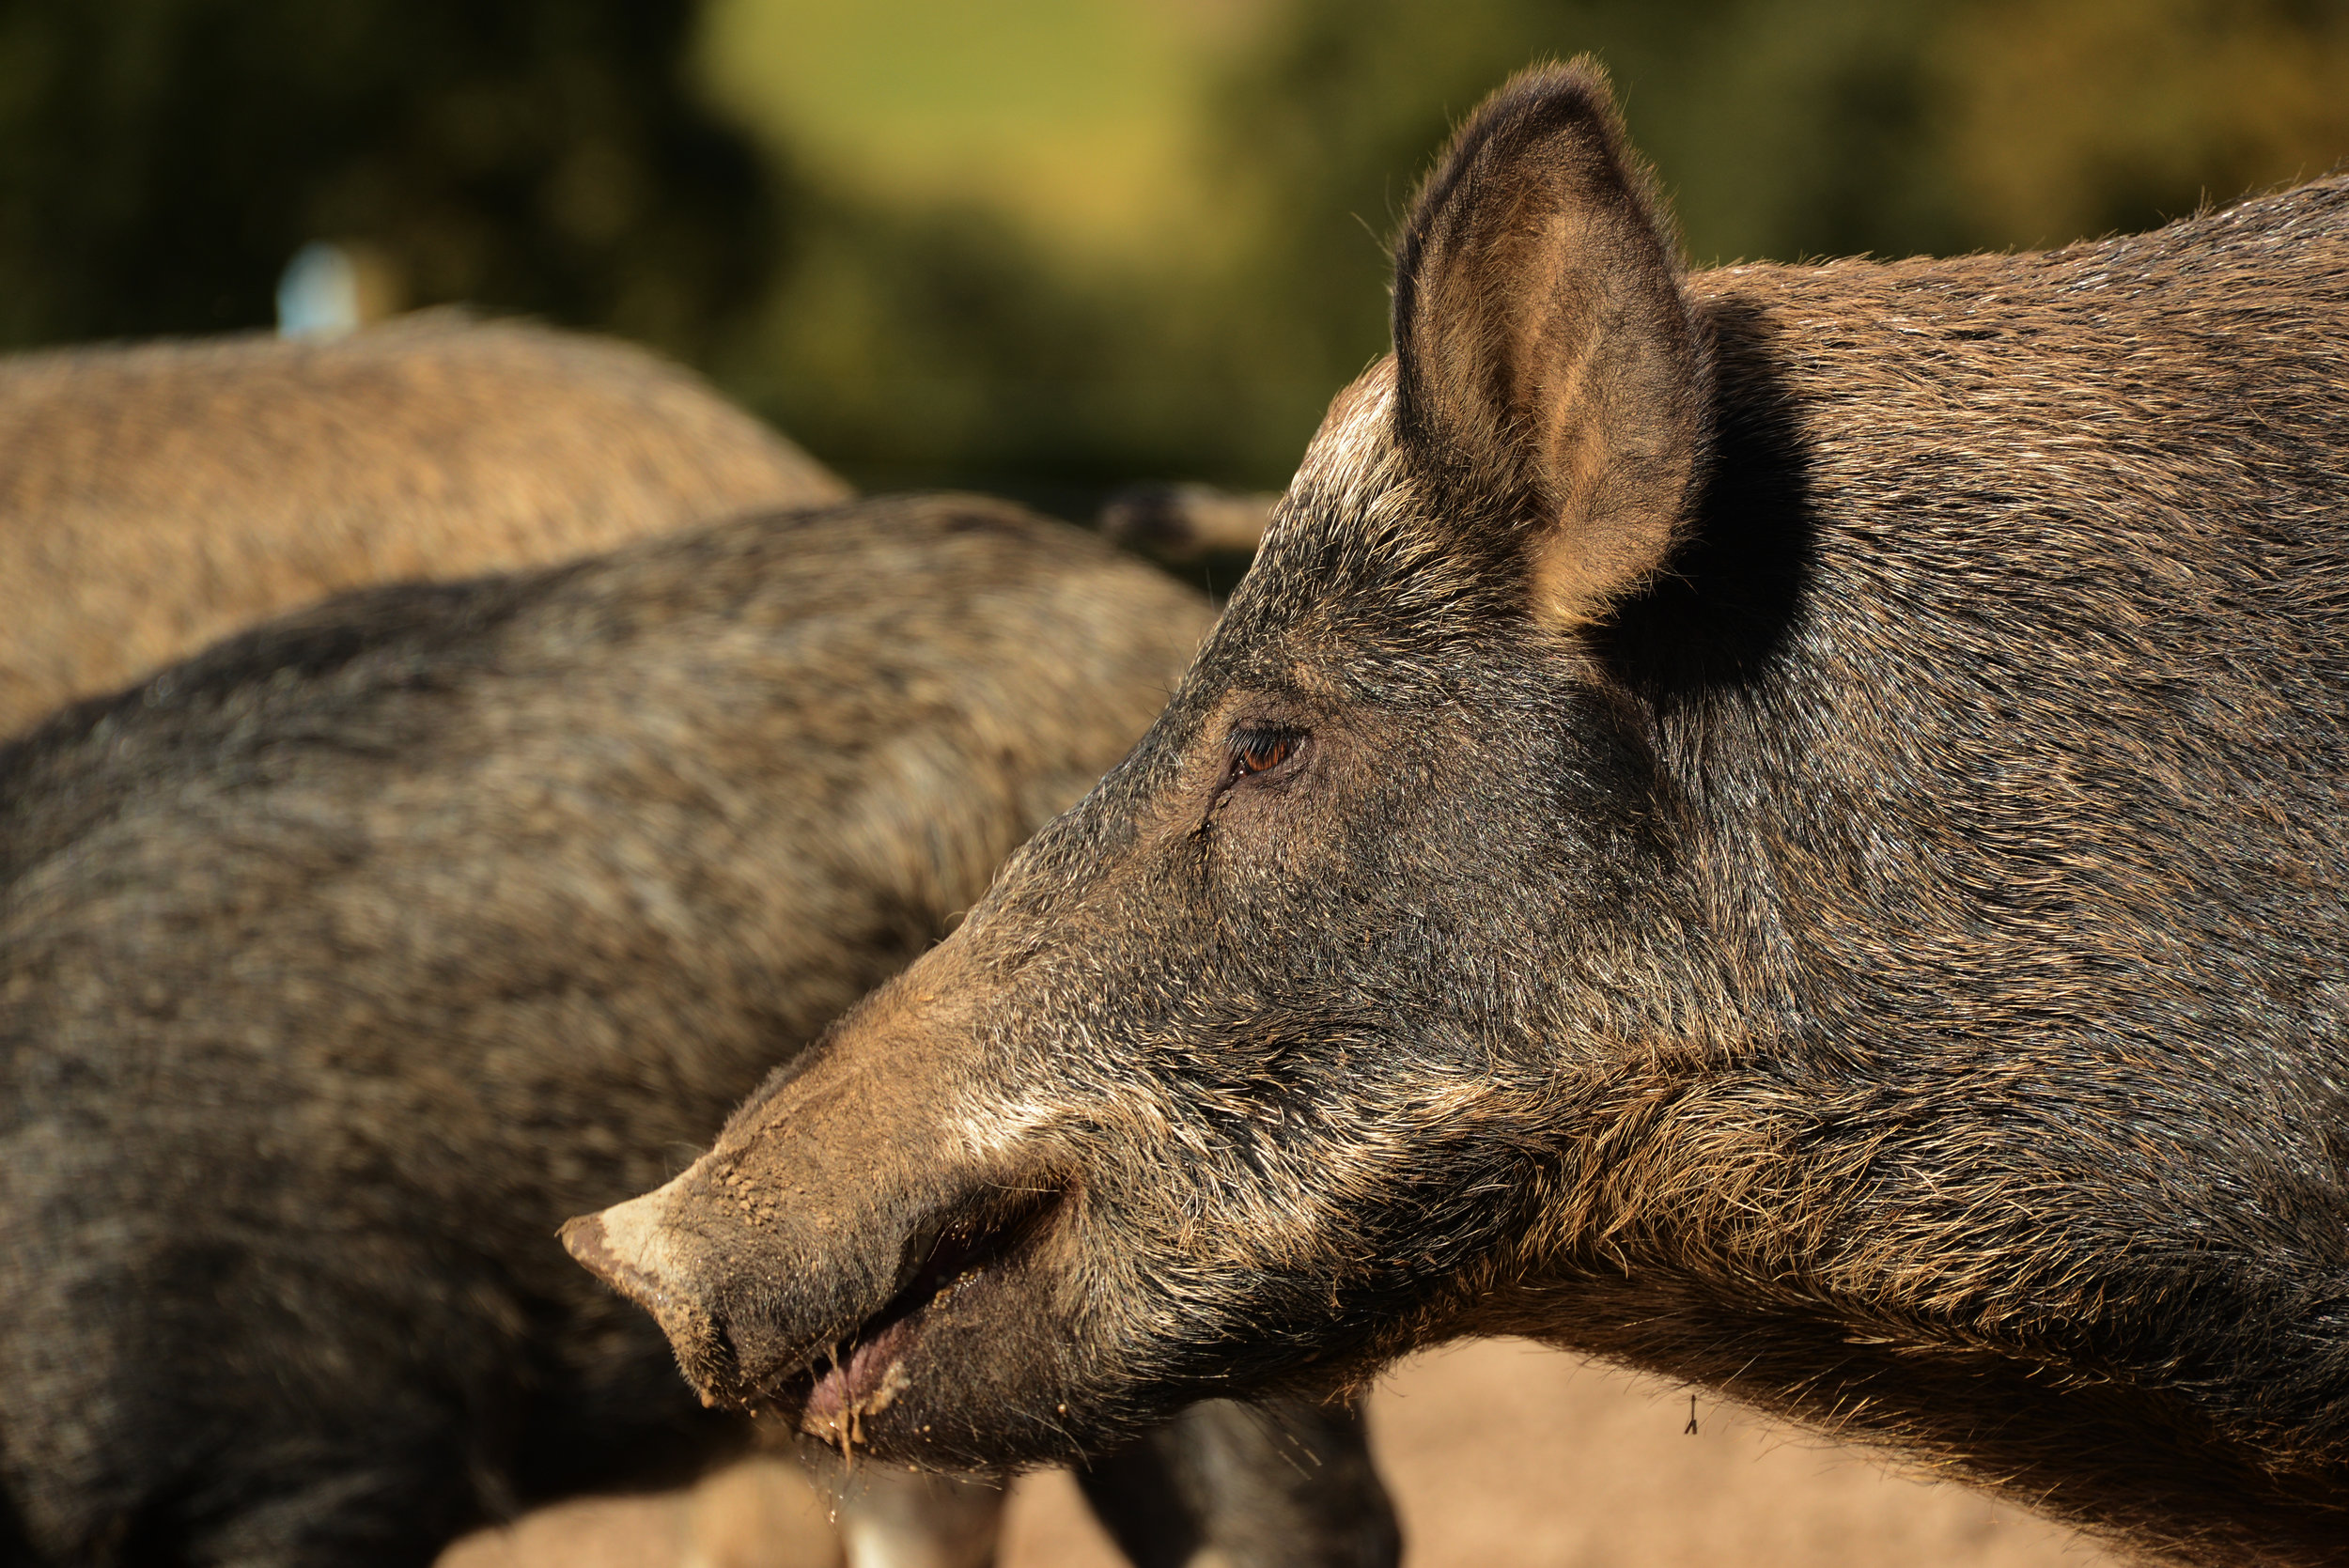 Adult iron age pig